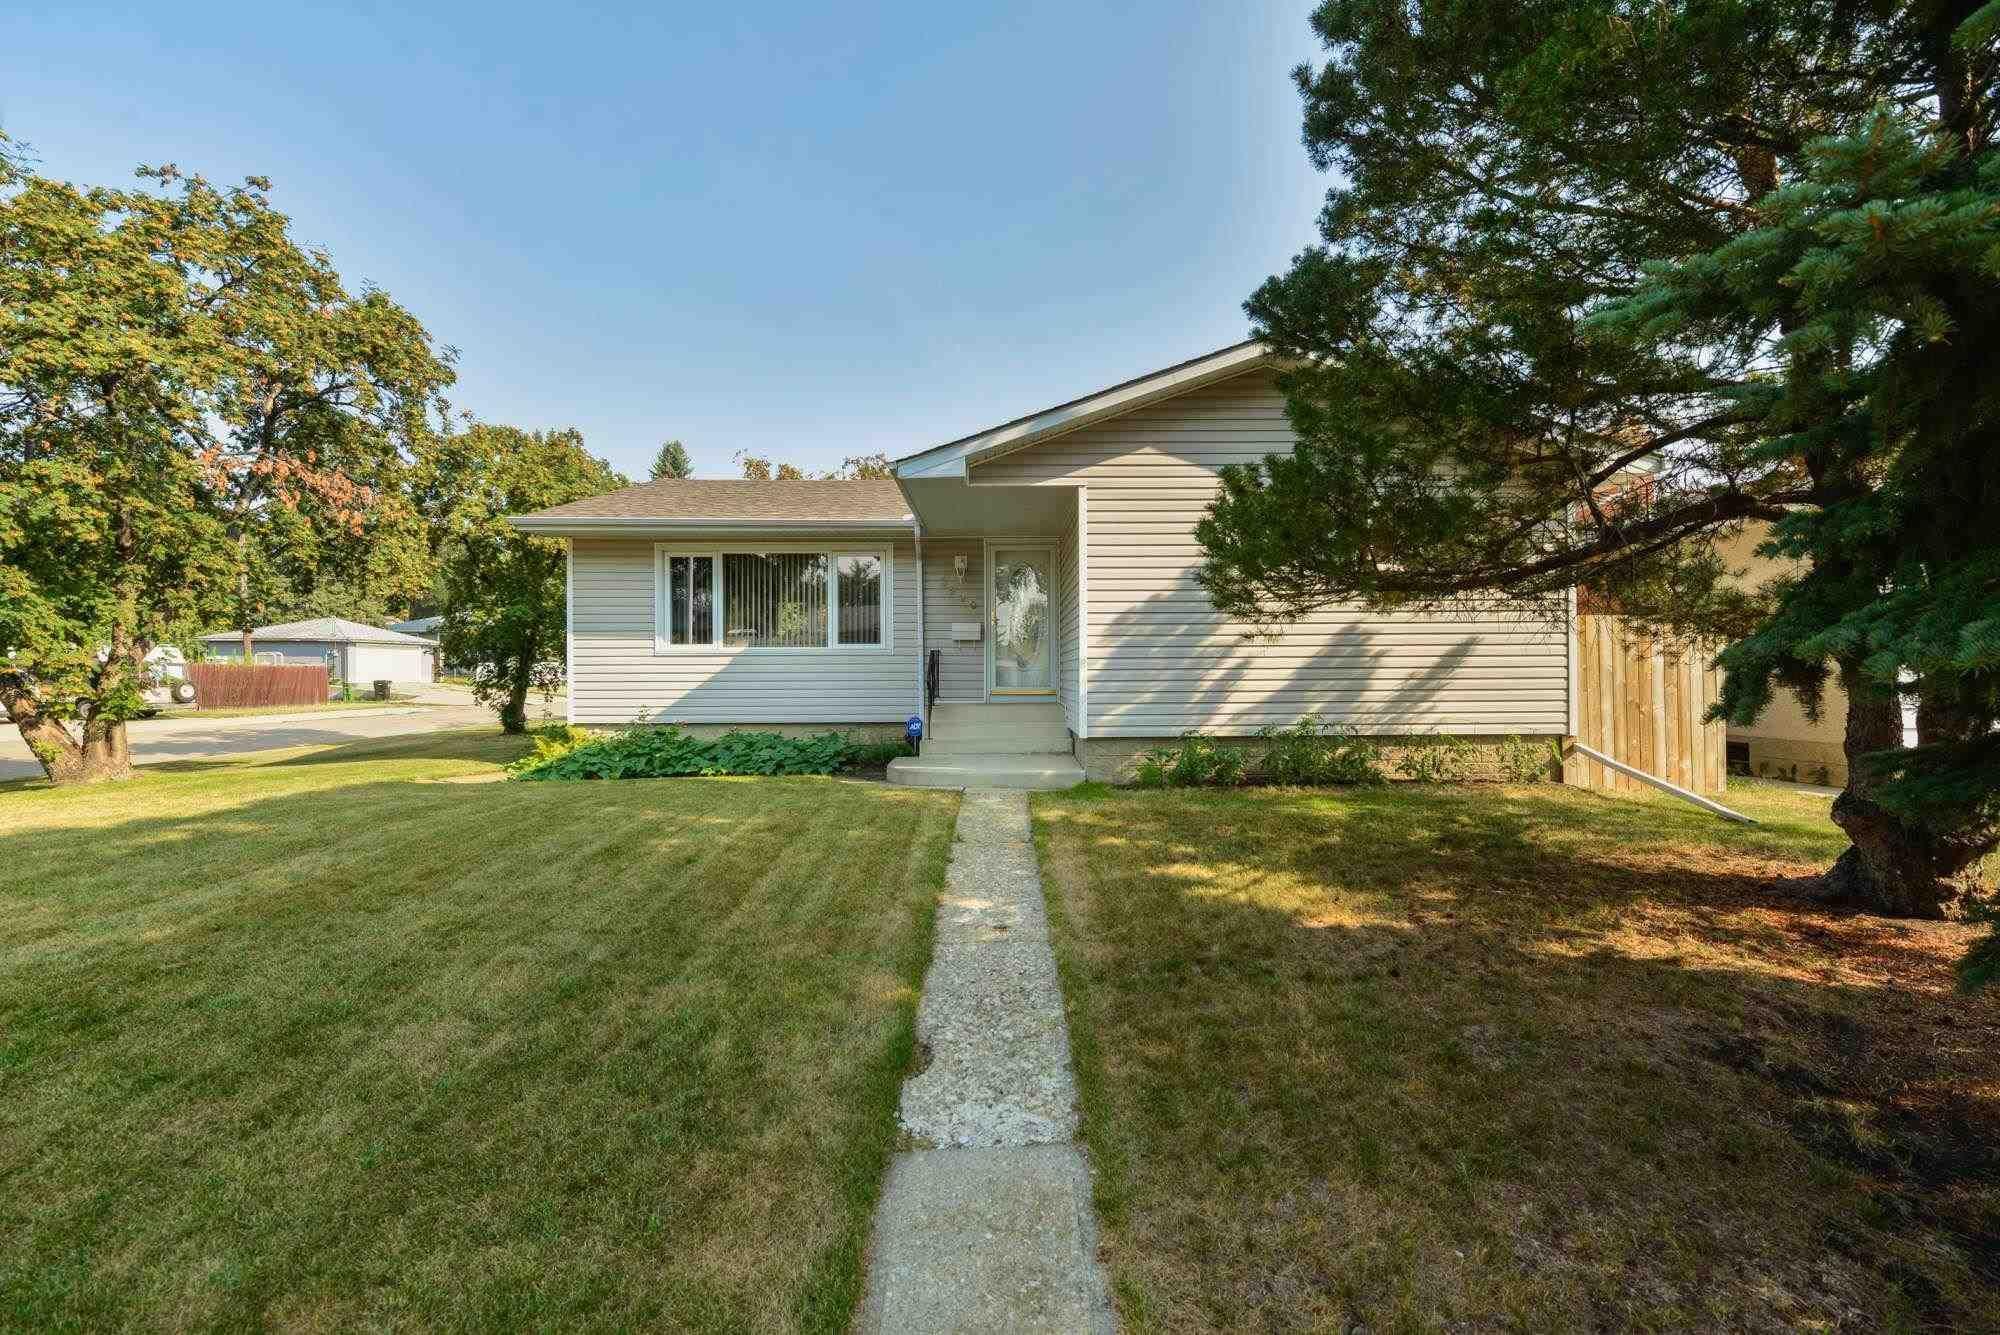 Main Photo: 3520 112 Avenue in Edmonton: Zone 23 House for sale : MLS®# E4257919